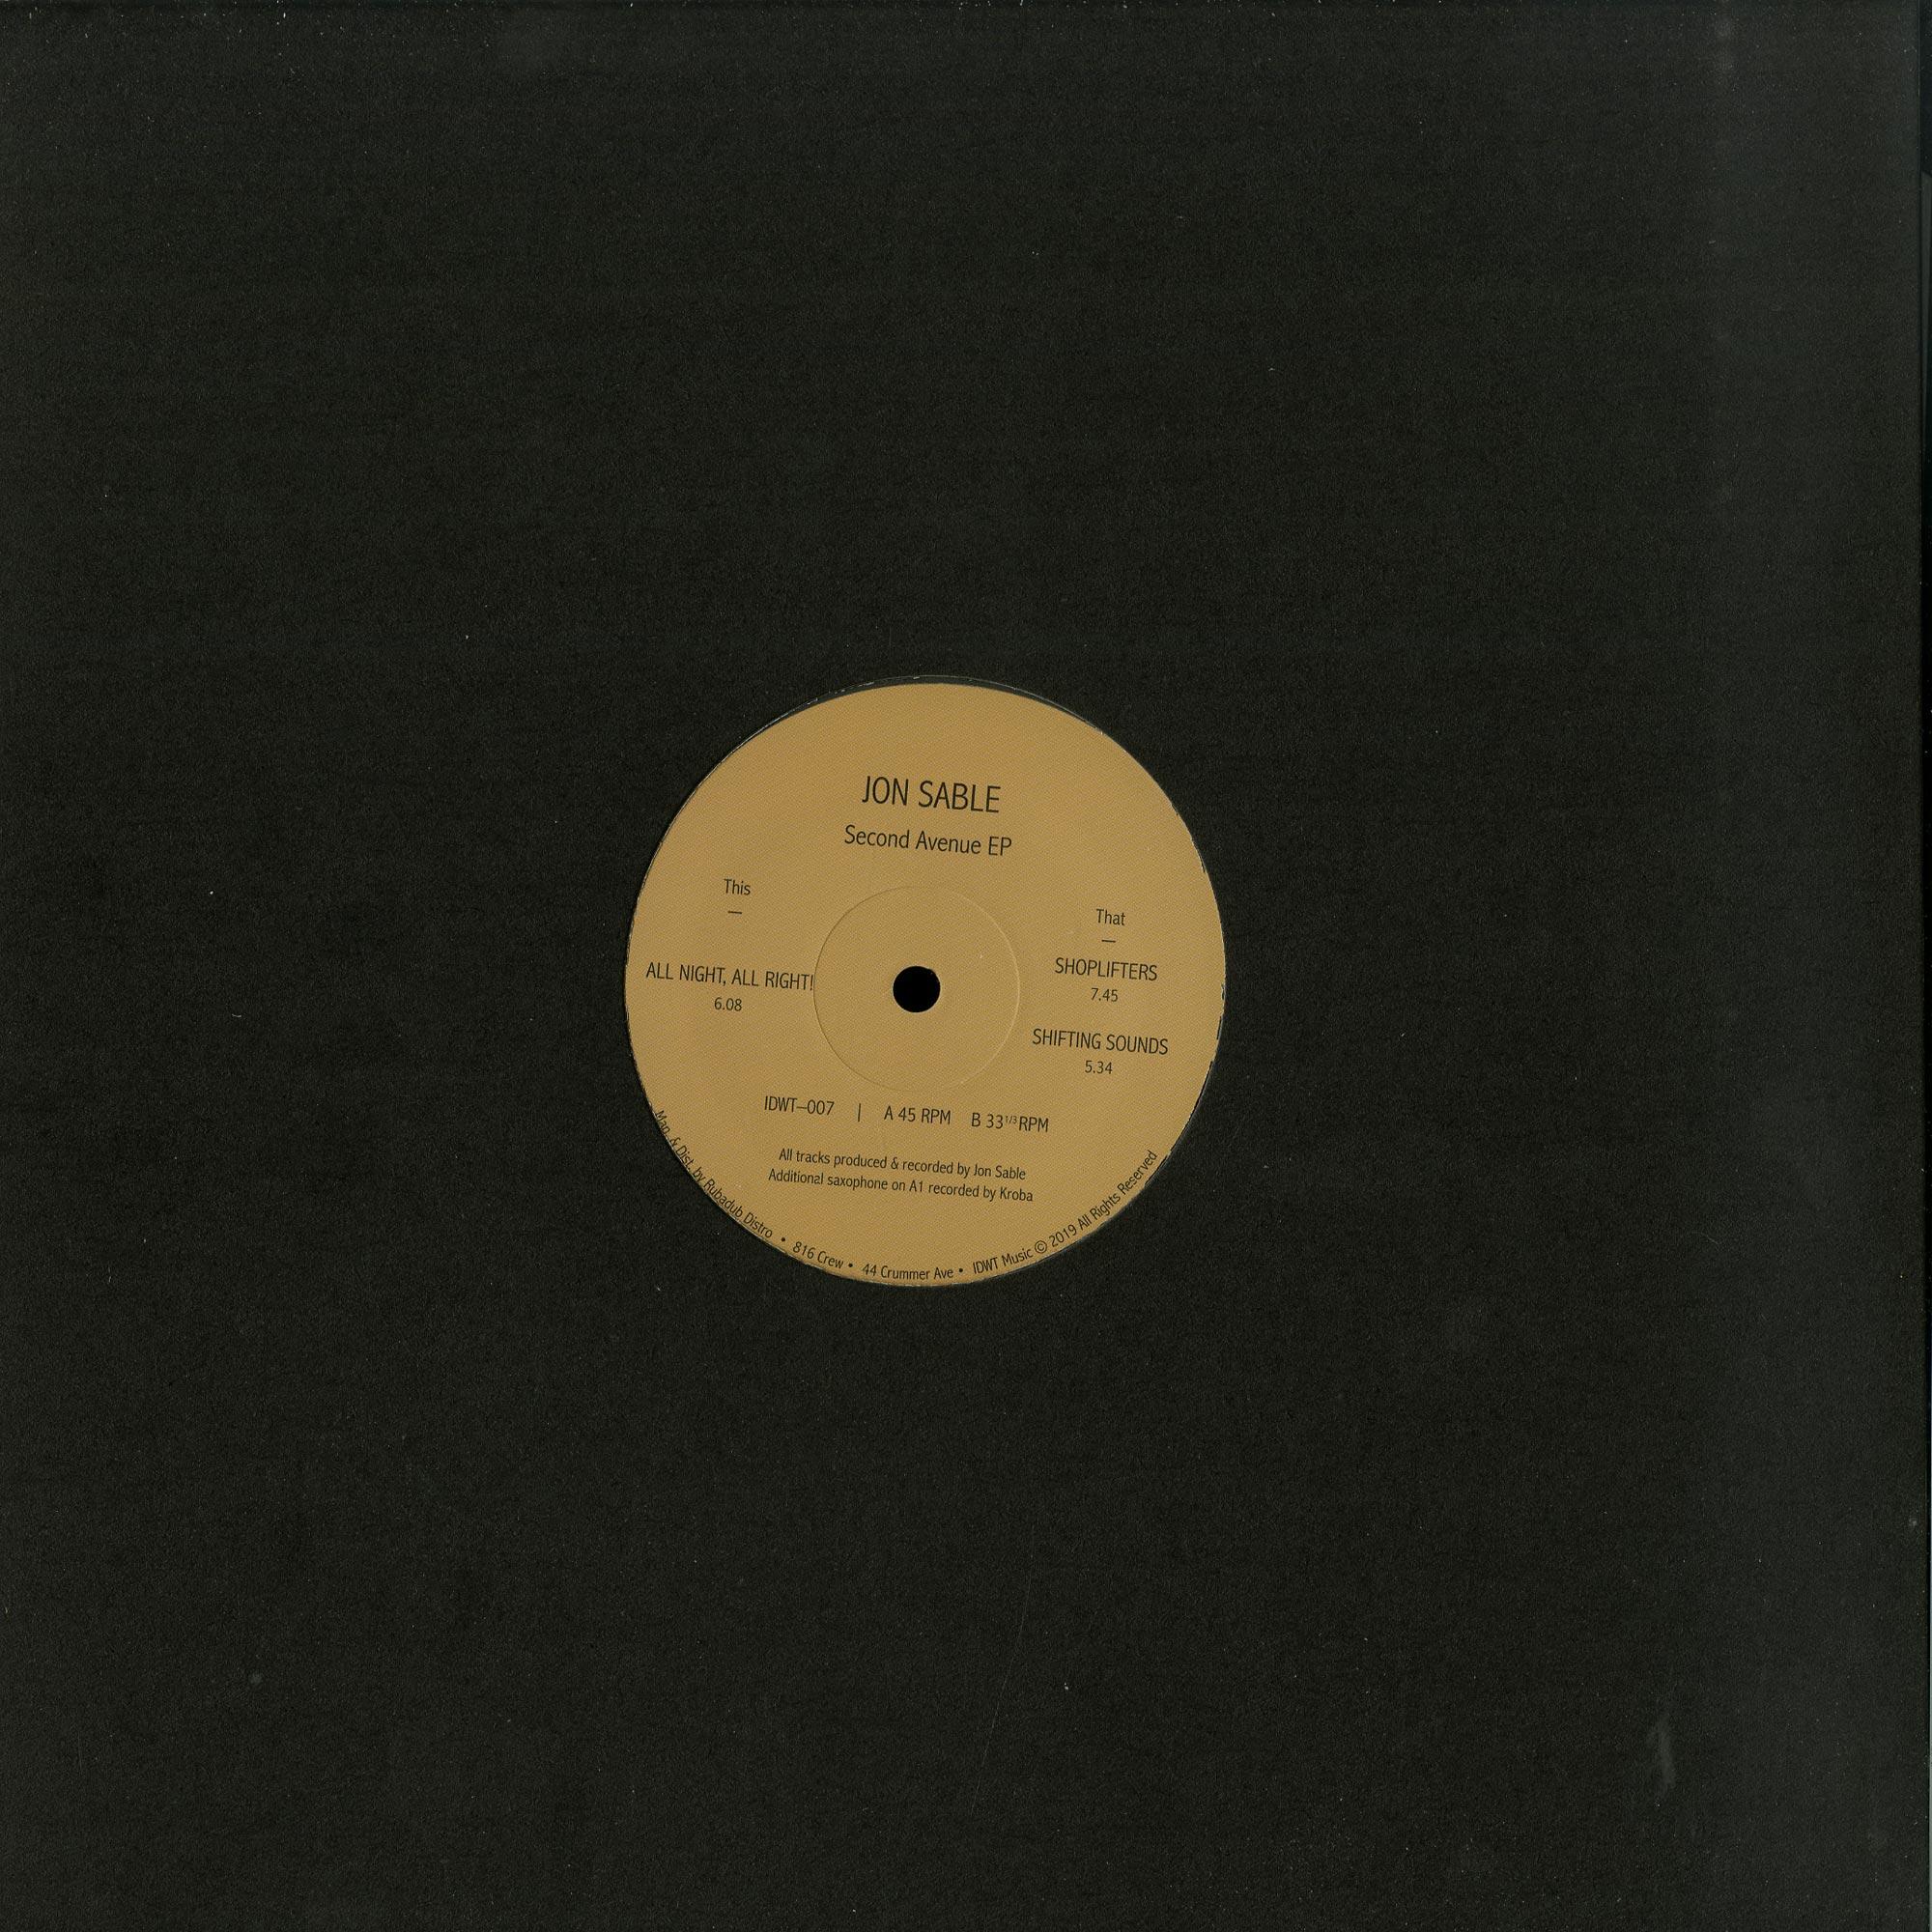 Jon Sable - SECOND AVENUE EP